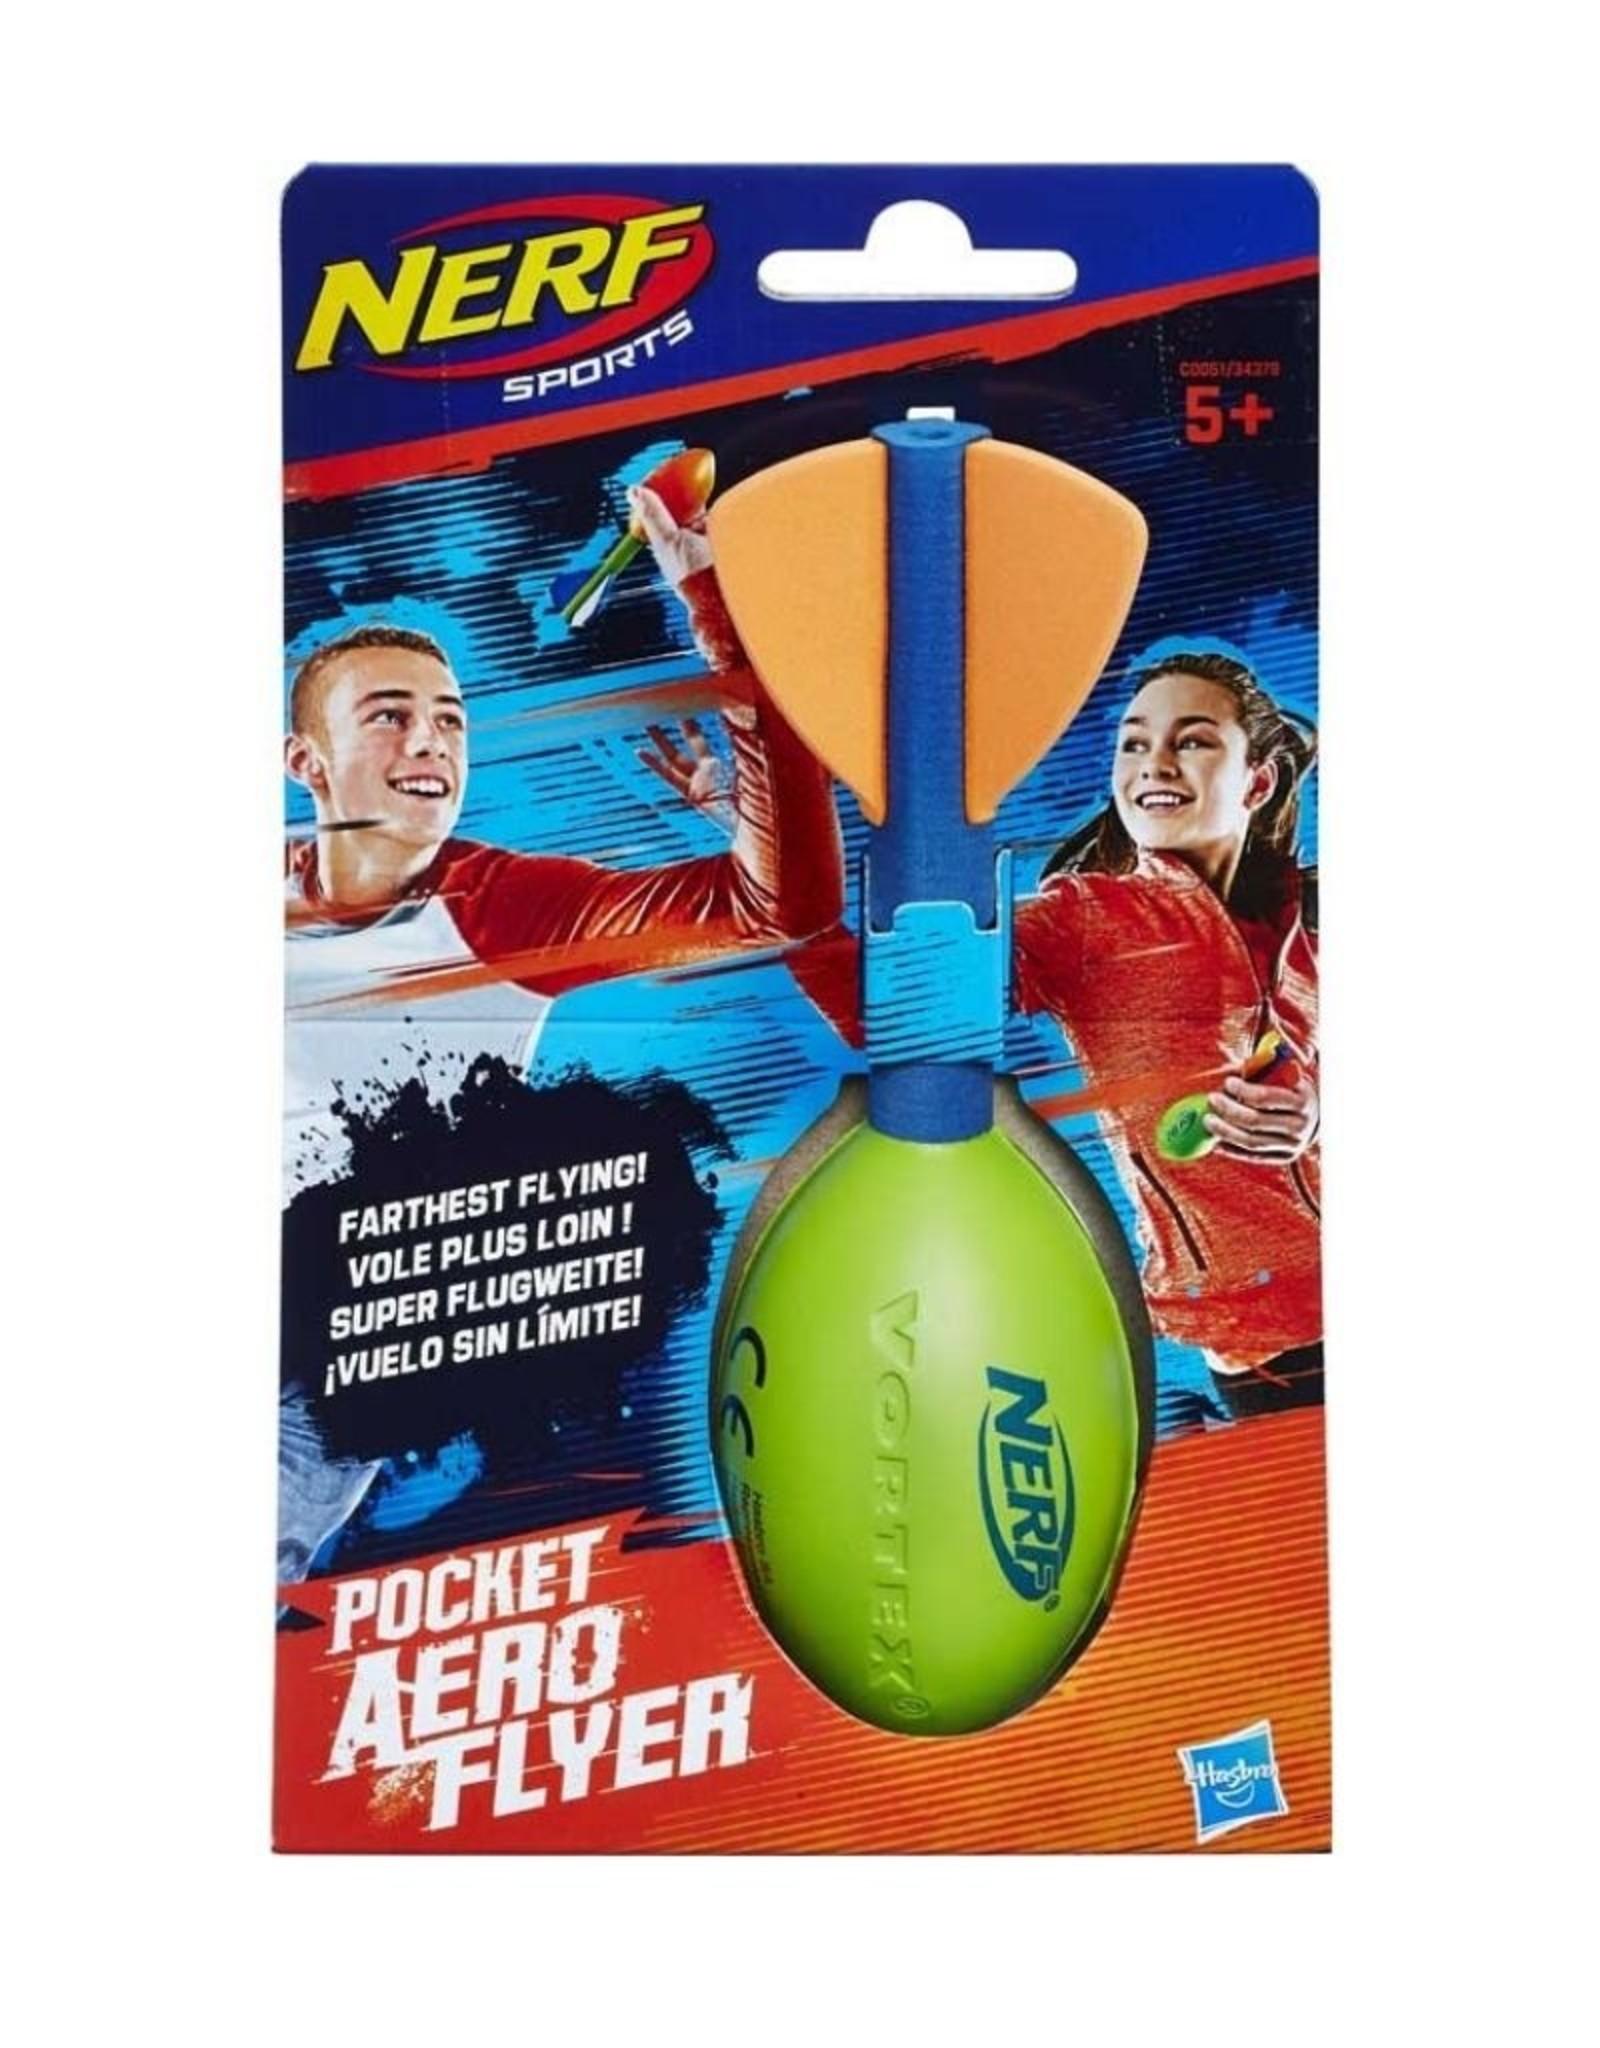 Nerf Pocket Aero Flyer